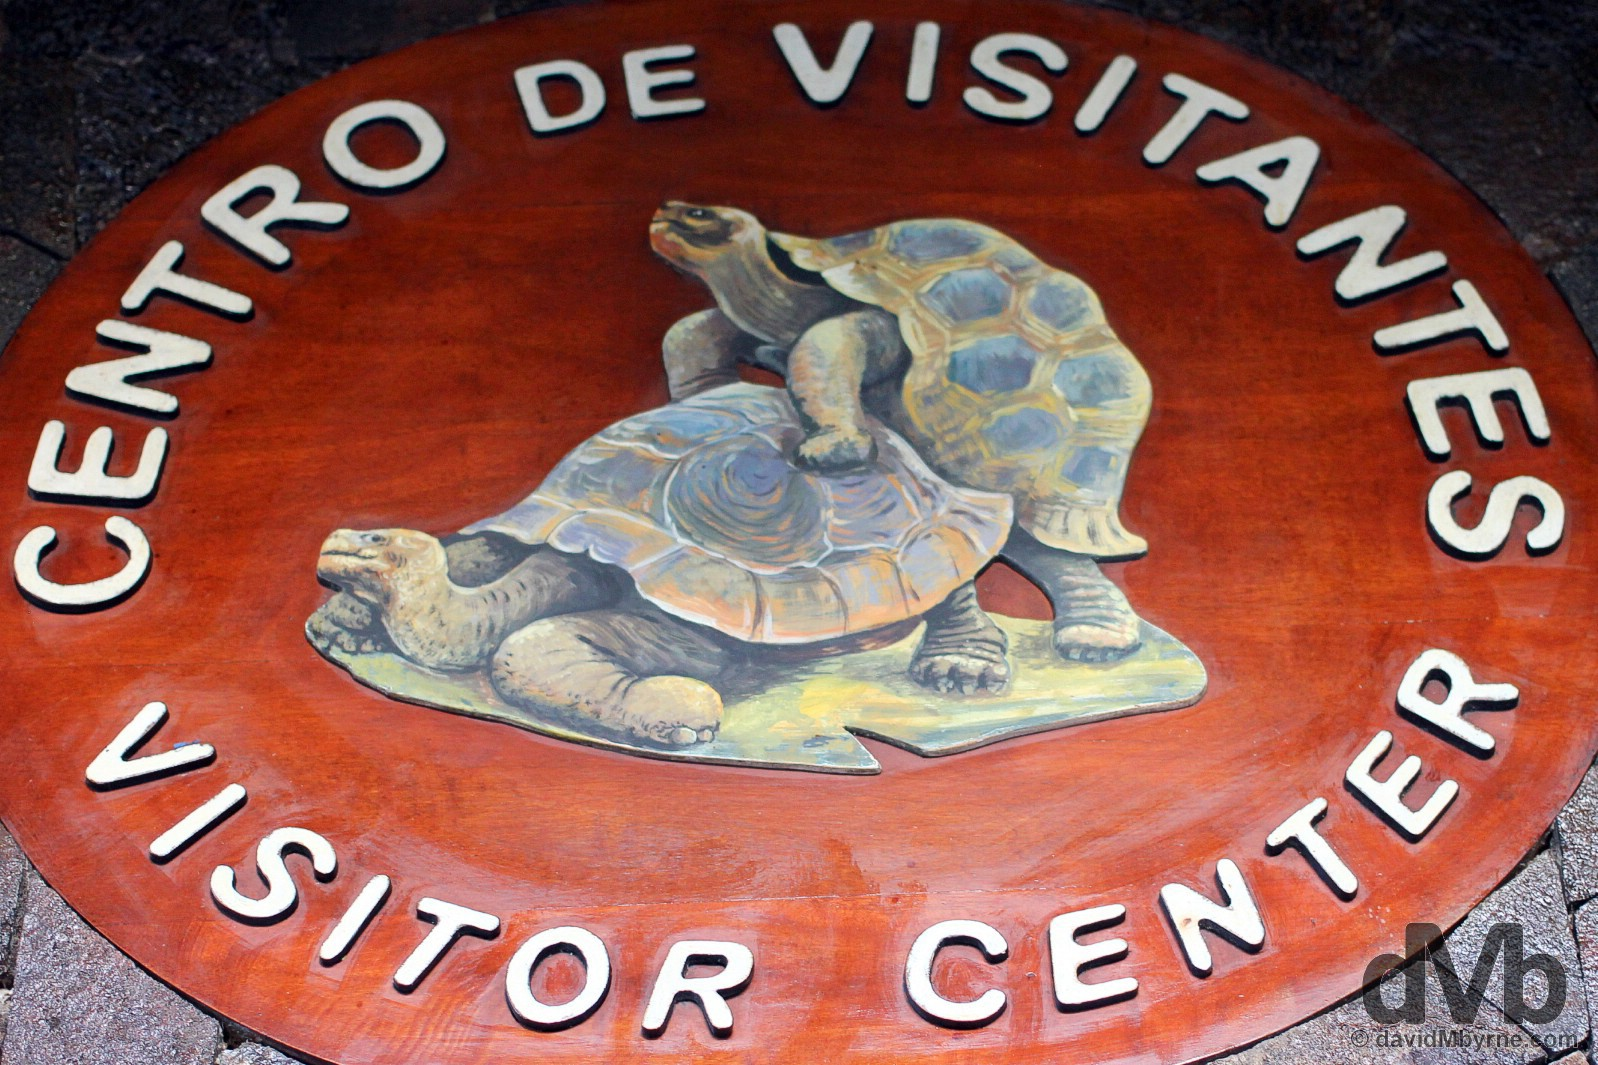 Visitor Center of the Tortoise Breeding Centre on Isla Isabela, Galapagos, Ecuador. July 19, 2015.